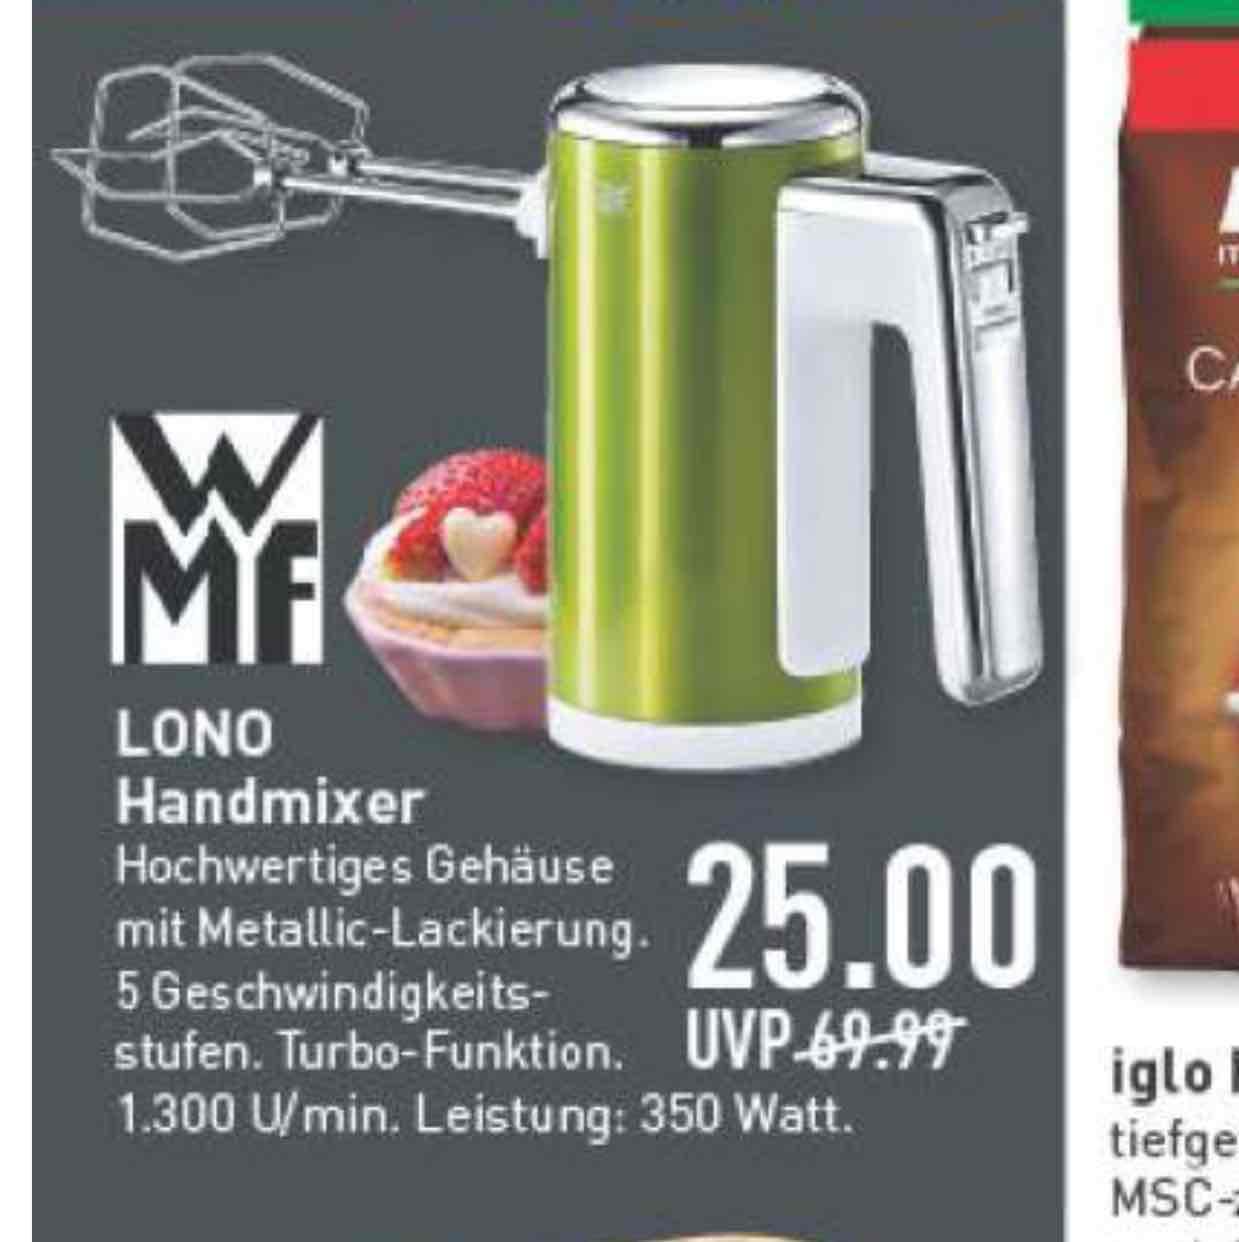 WMF Lono Handmixer 25€